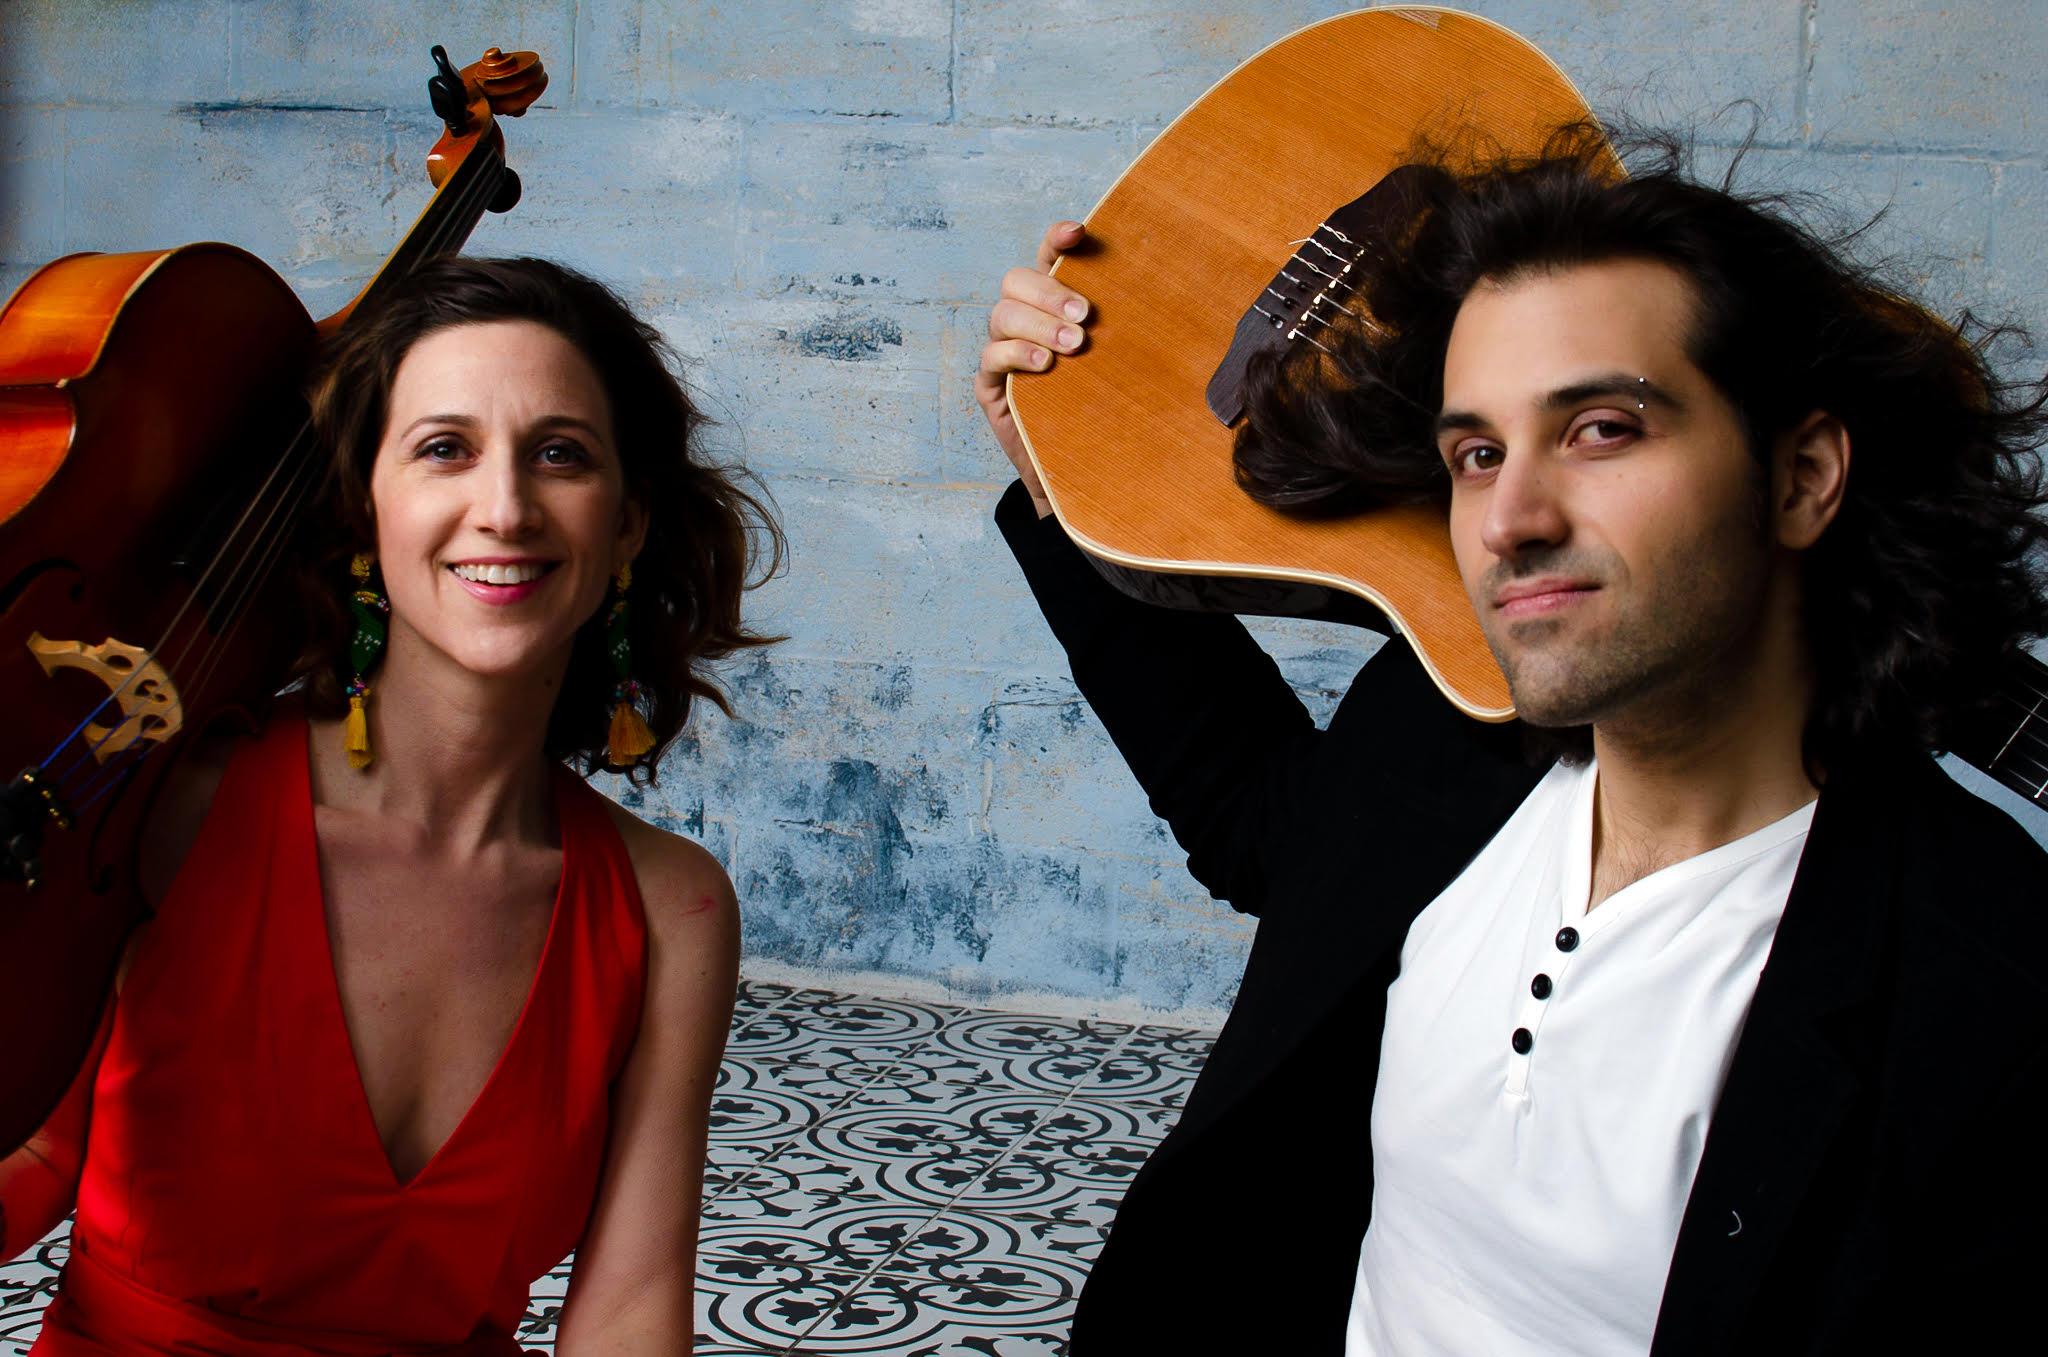 Eleanor Dubinsky and Dario Acosta Teich: